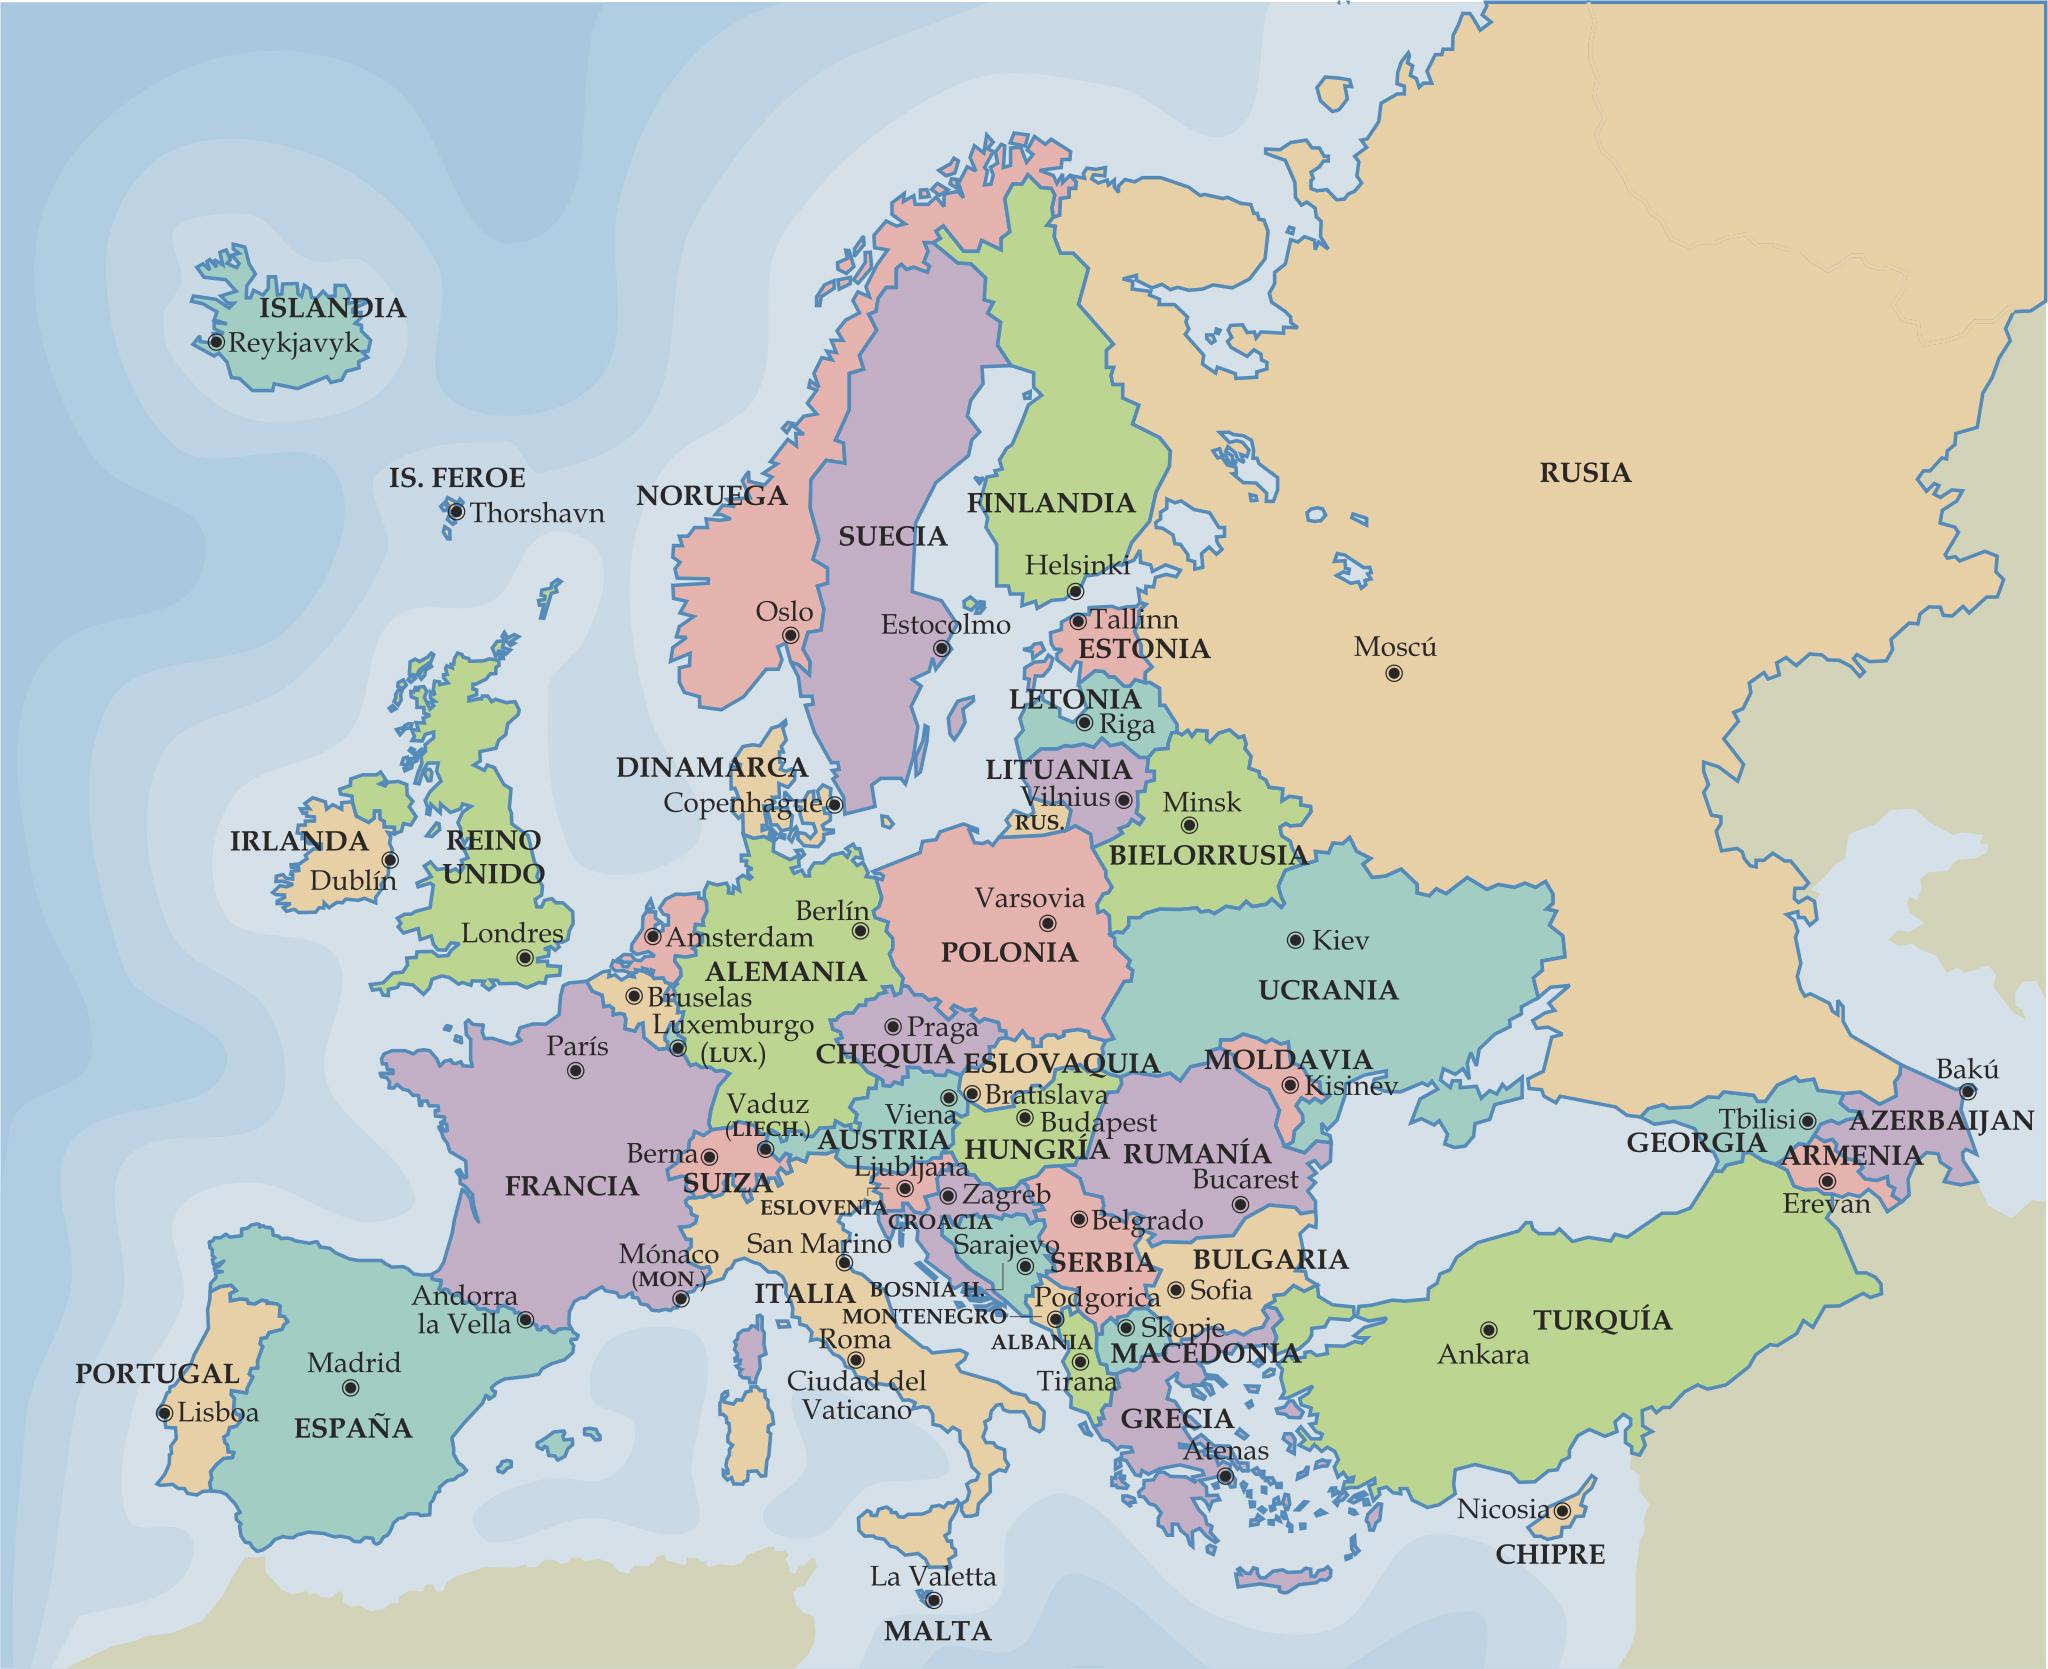 Mapa político de Europa para escolares infantil